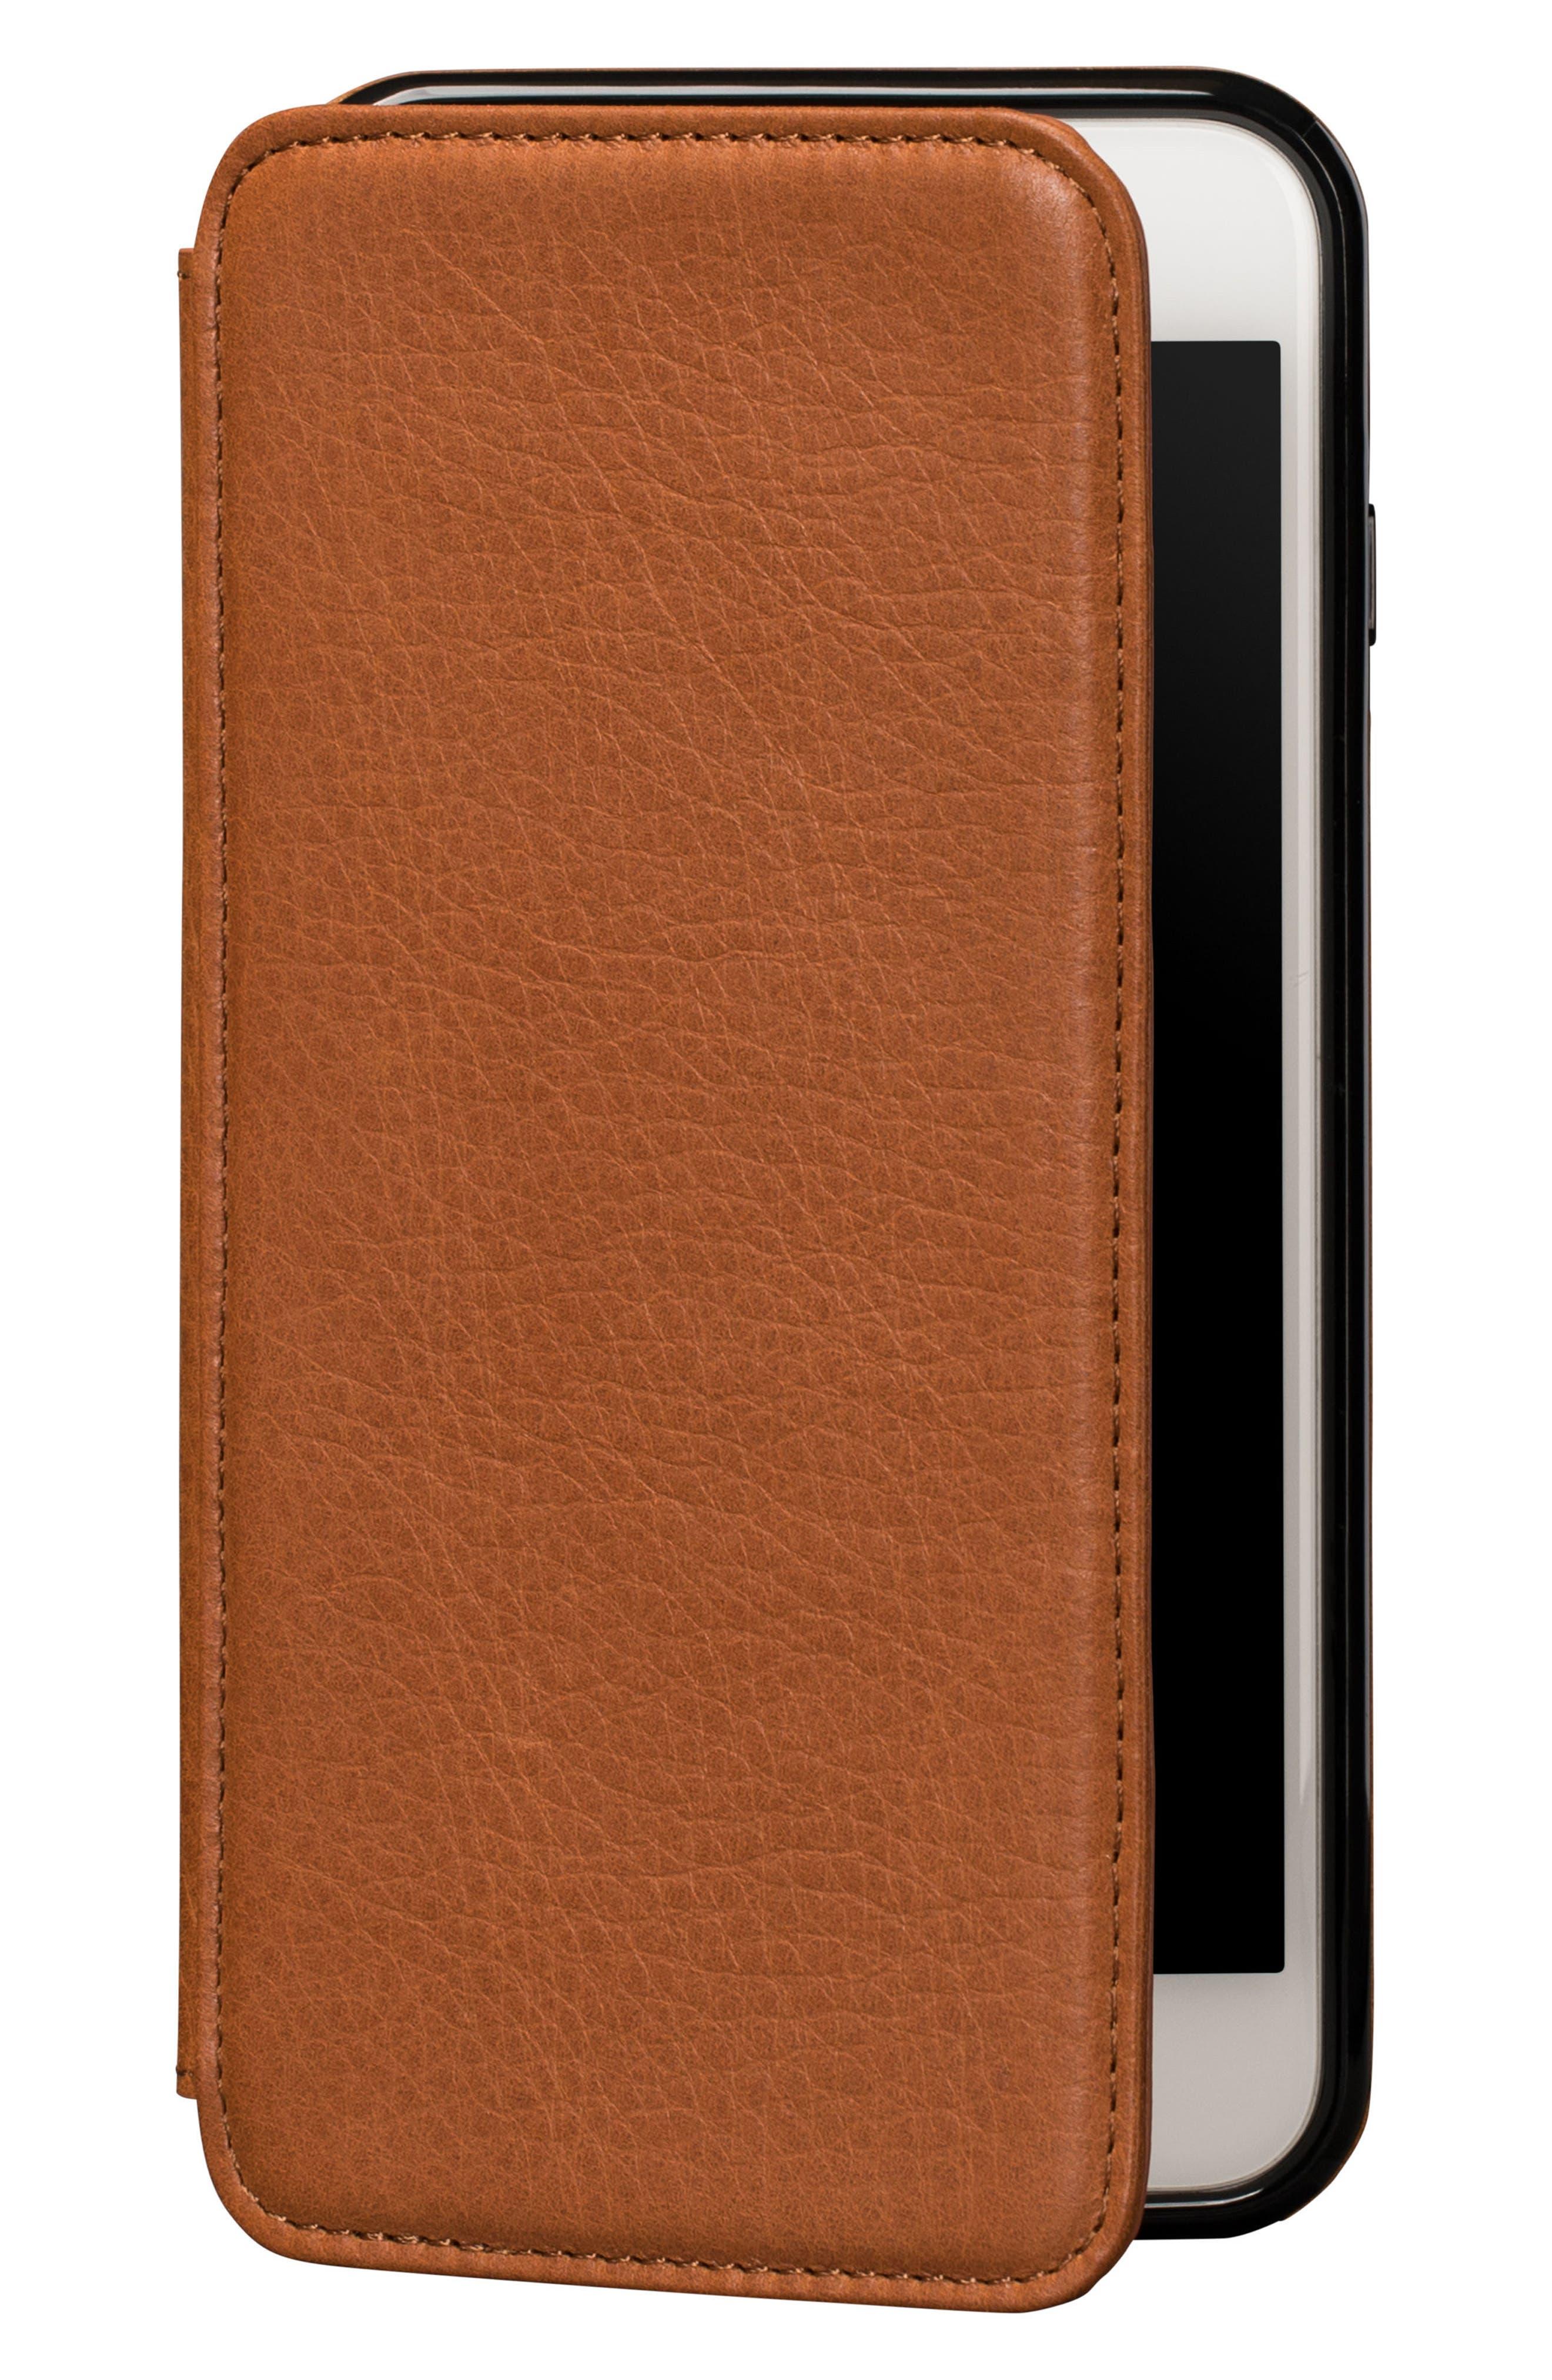 Bence iPhone 7/8 Plus Walletbook,                             Main thumbnail 1, color,                             SADDLE